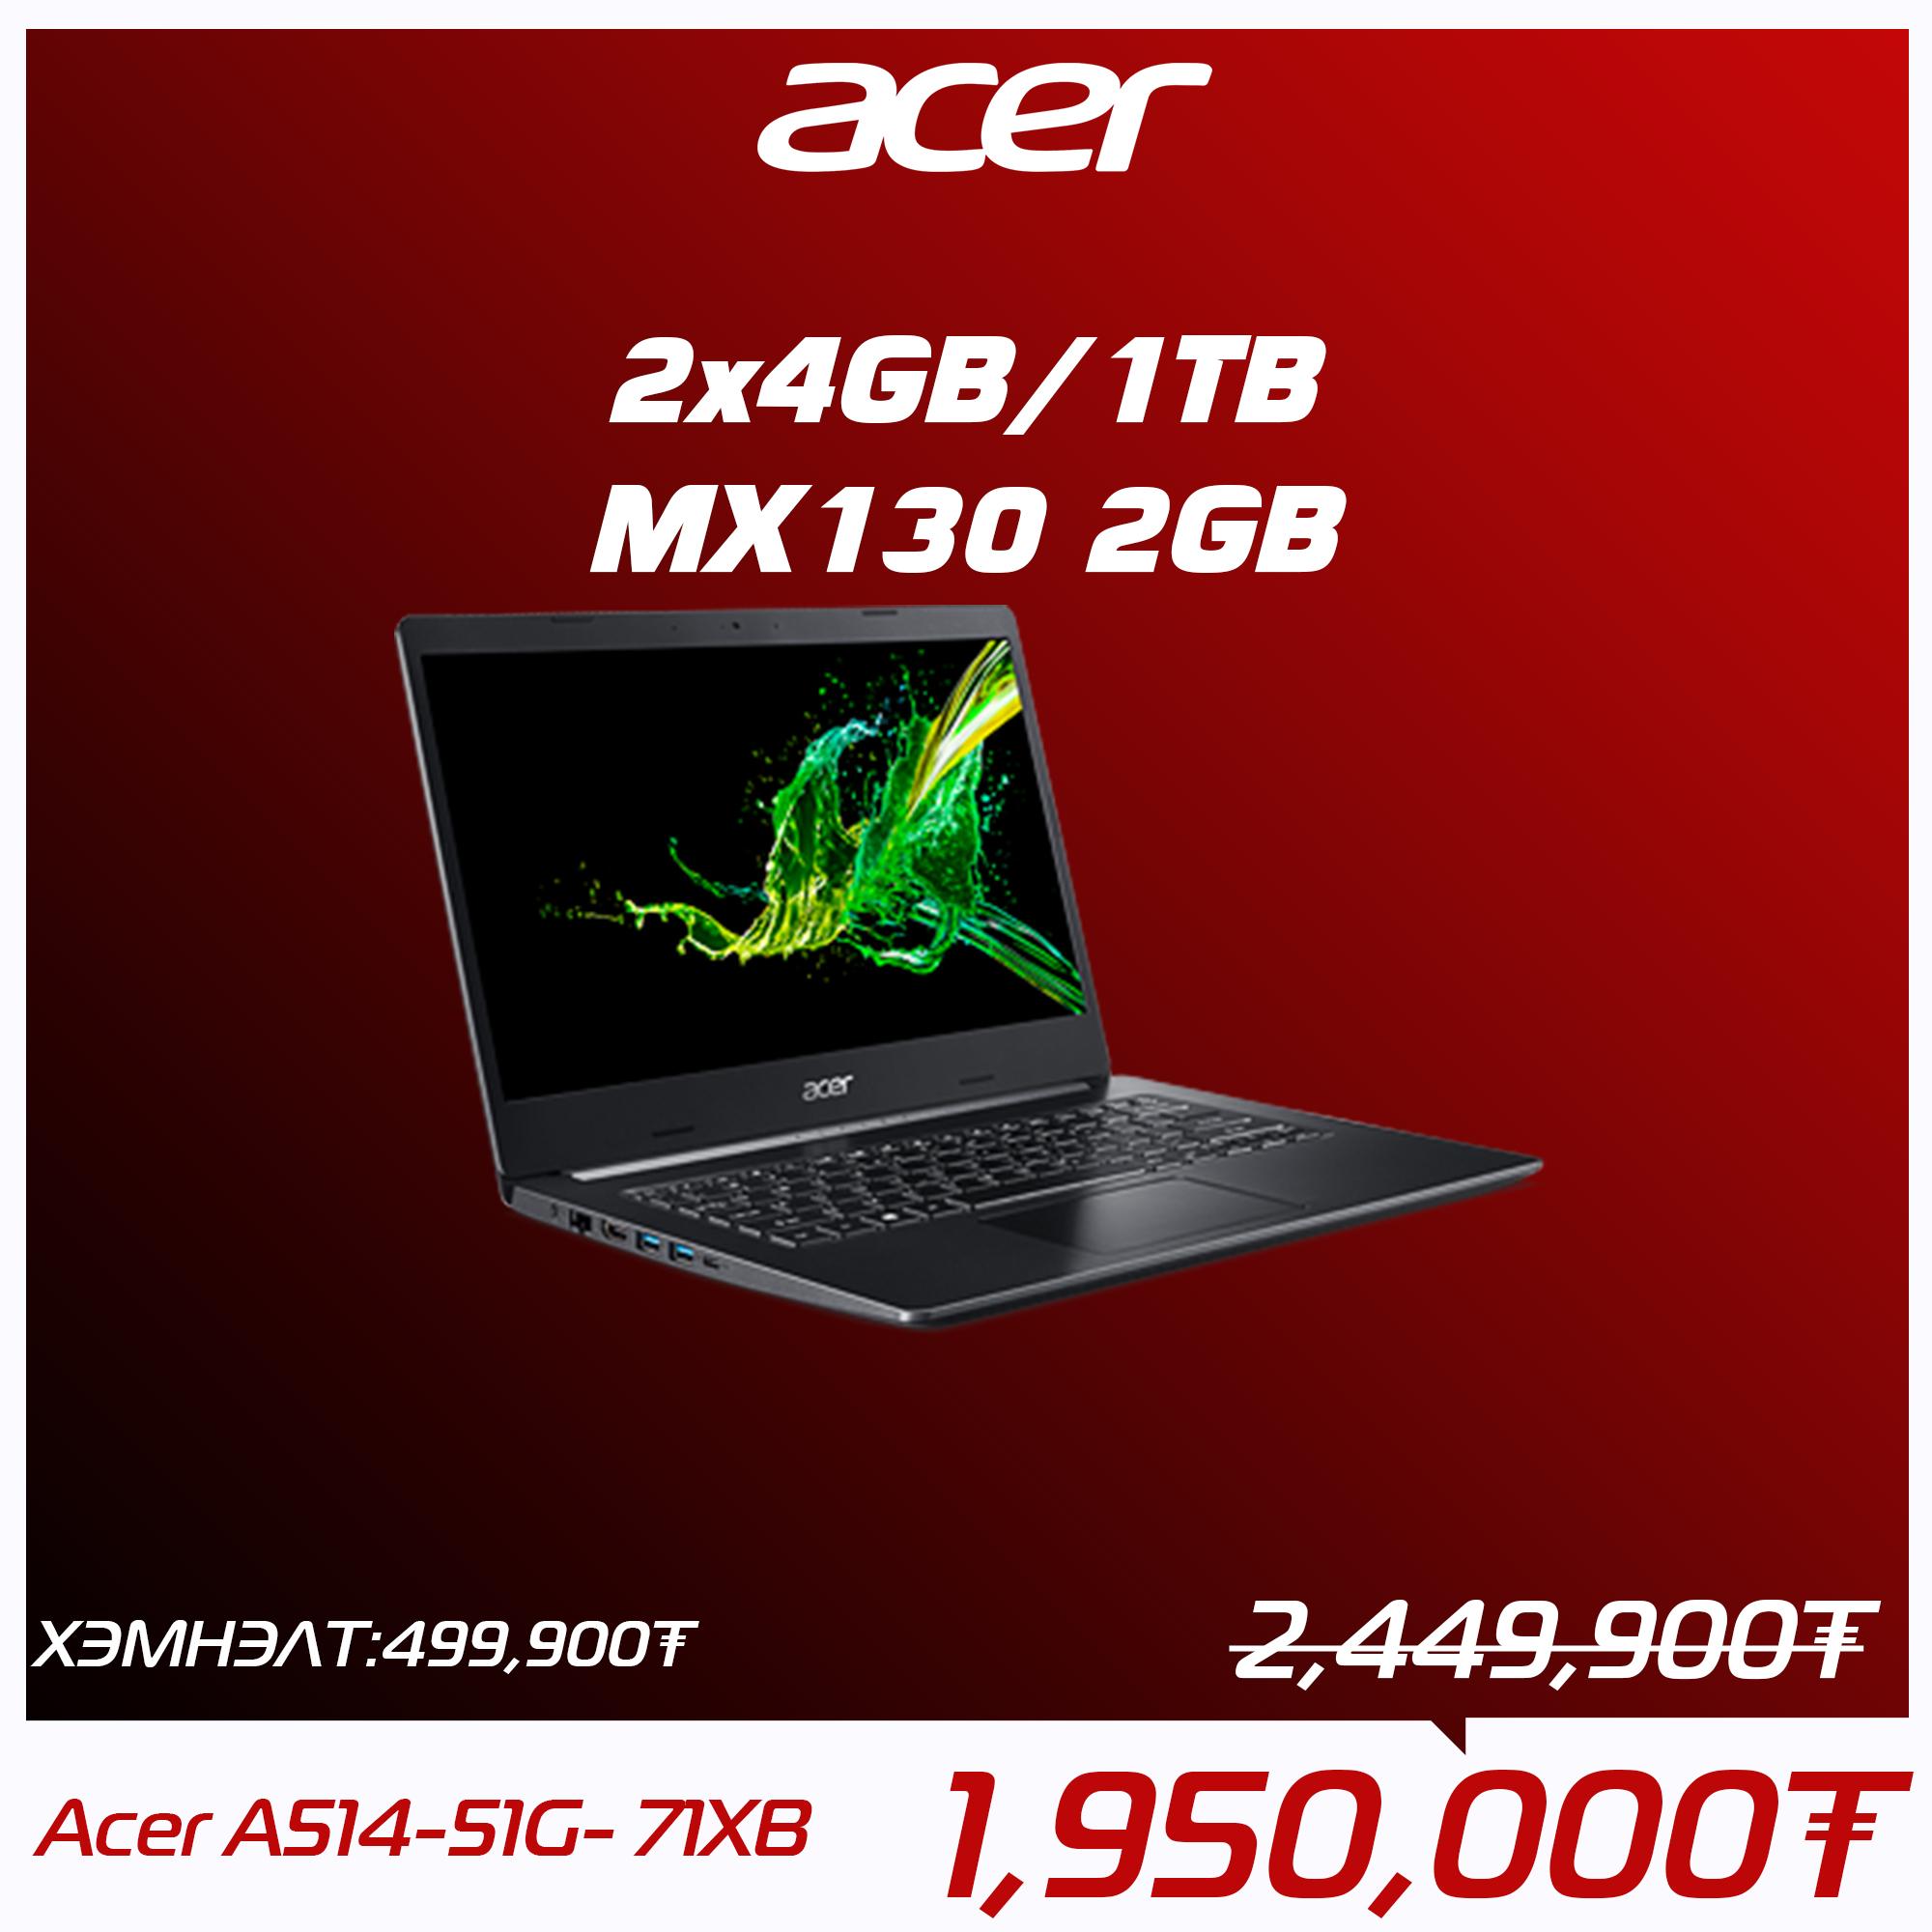 Acer A514-51G- 71XB